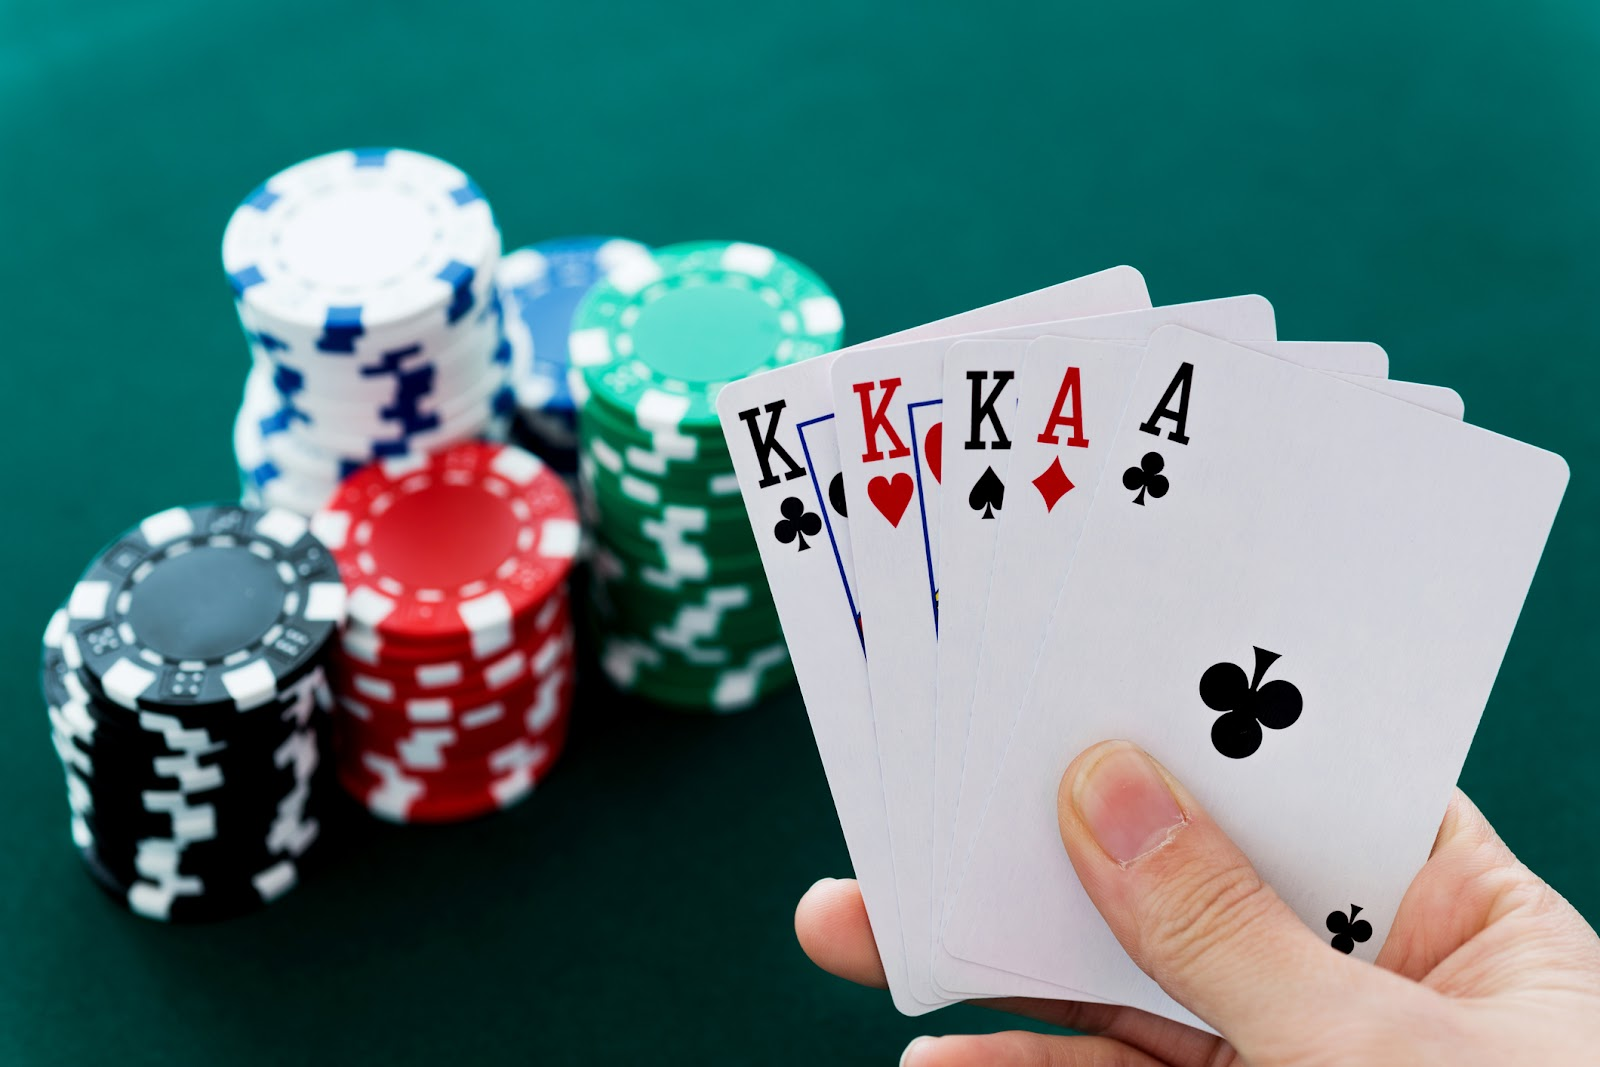 van-bai-poker-cf68